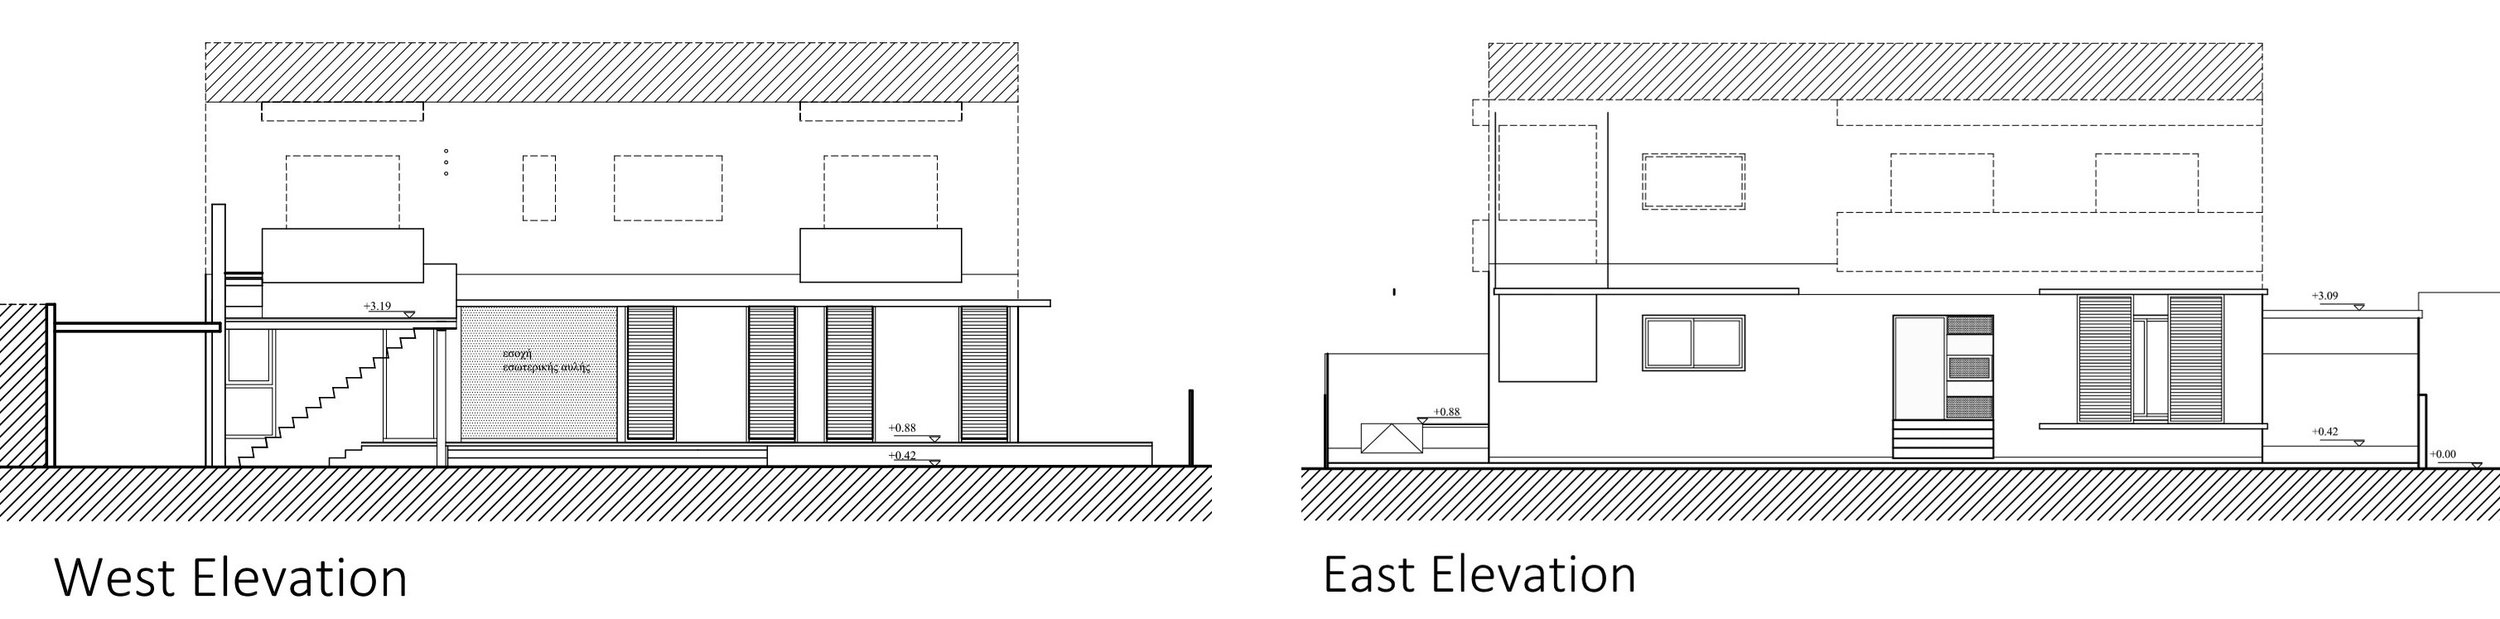 elevations new 3.jpg